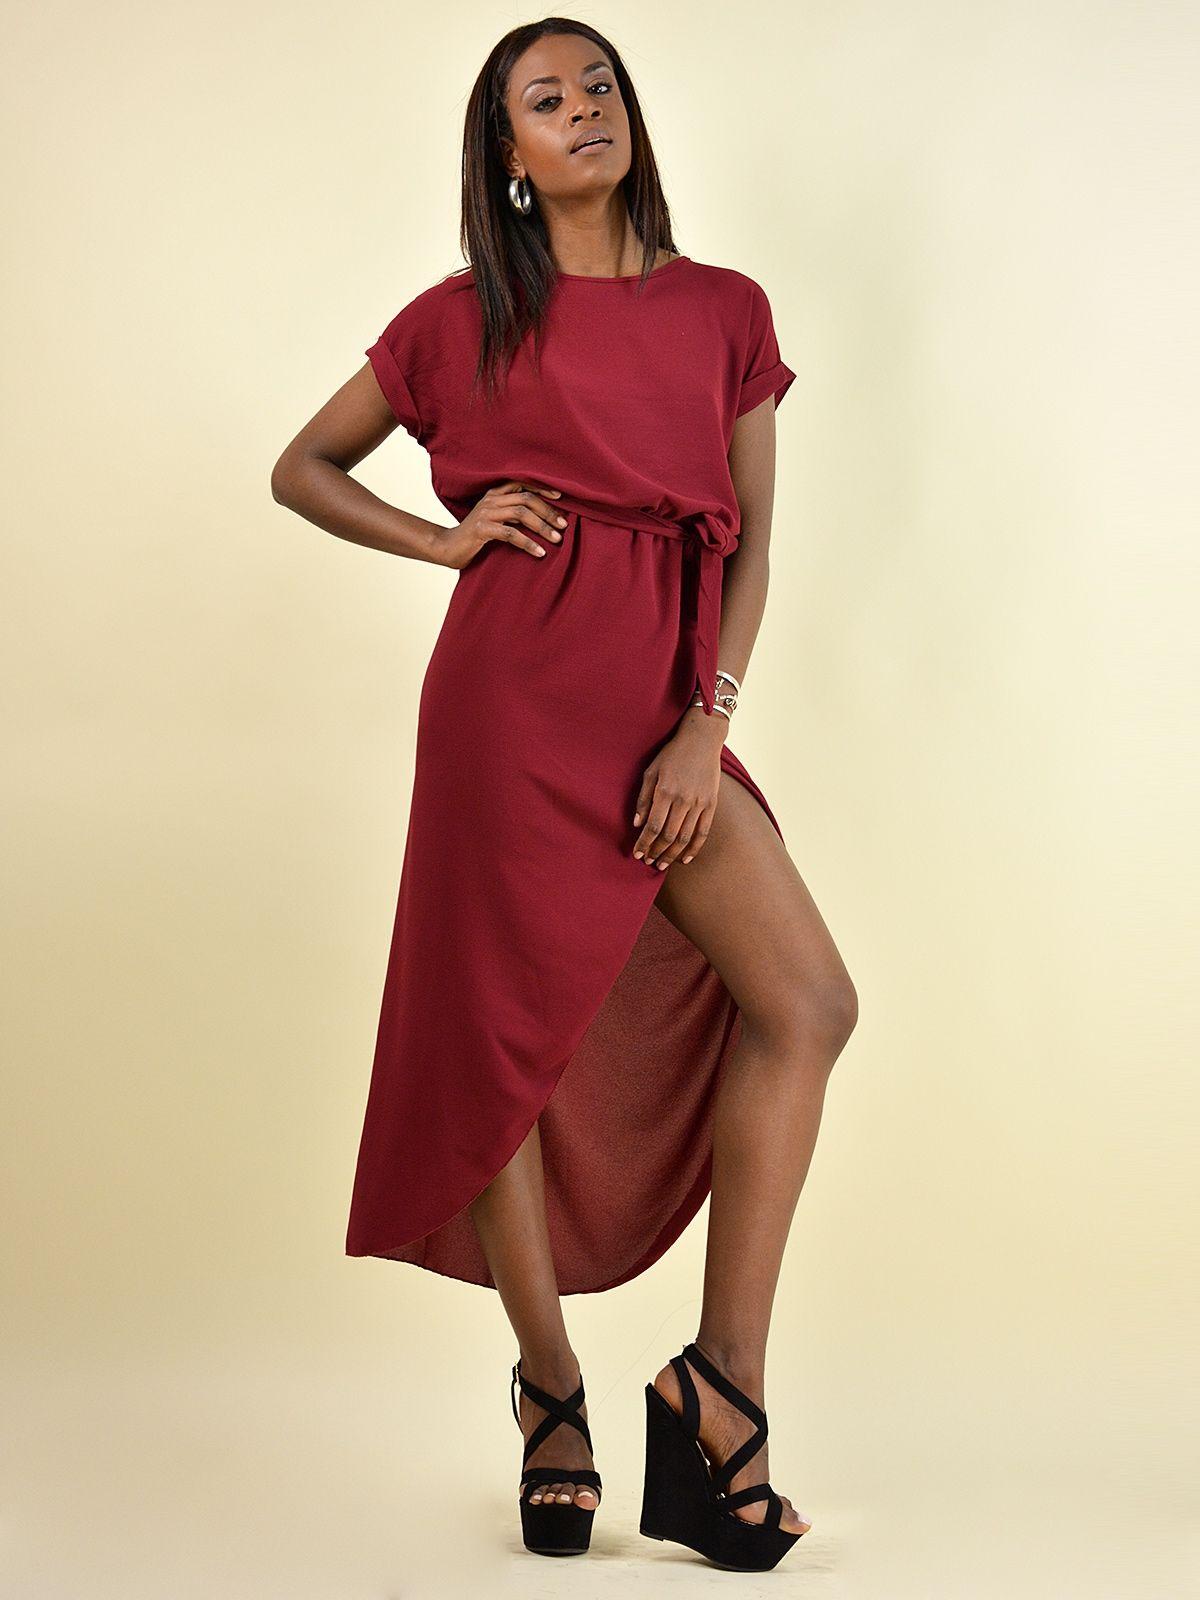 440fa7e1f8a F20801 Φόρεμα Ασύμμετρο με Ζωνάκι - Decoro - Γυναικεία ρούχα ...